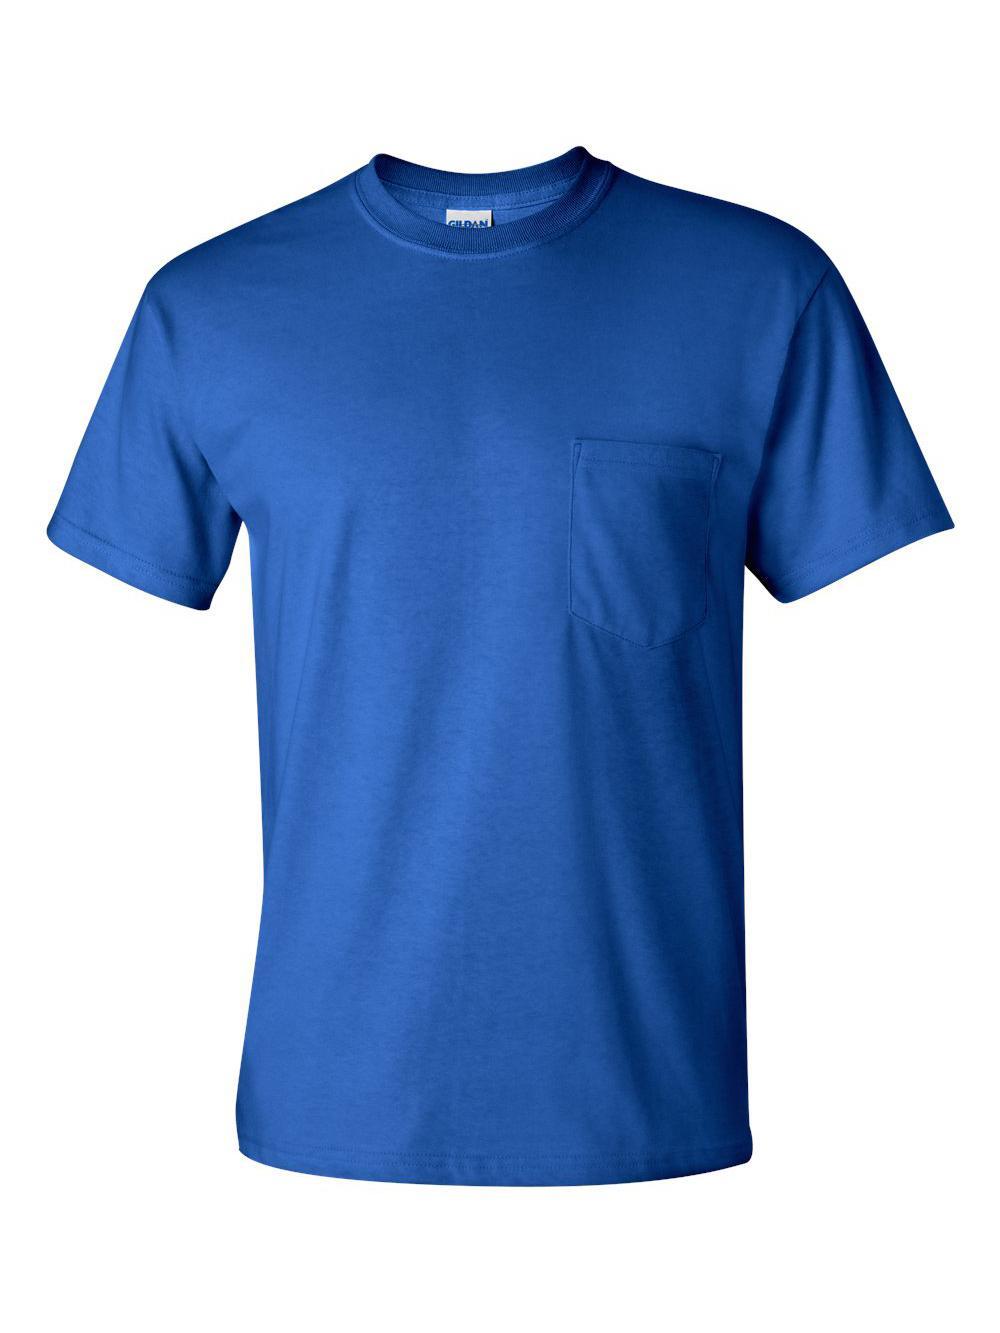 Gildan-Ultra-Cotton-T-Shirt-with-a-Pocket-2300 thumbnail 30